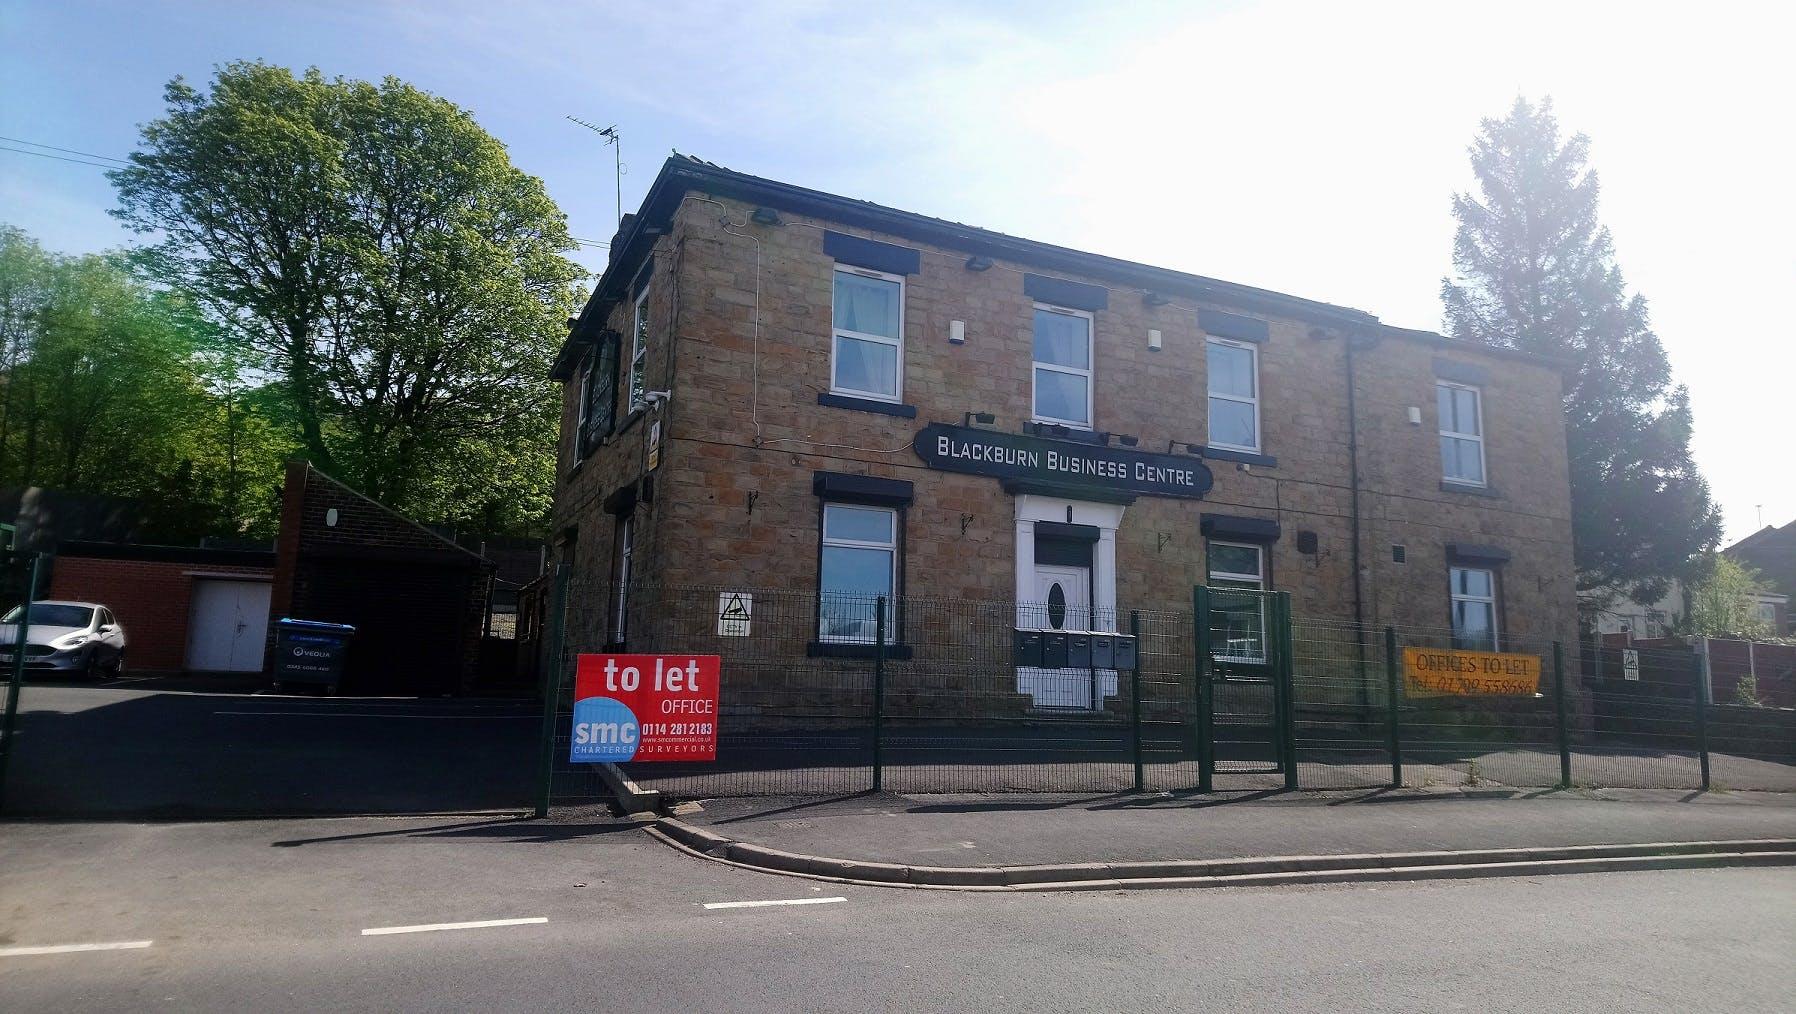 Blackburn Business Centre, Blackburn Road, Sheffield, Offices To Let - Blackburn_Business_Centre_Sheffield_Offices_To_Let.jpg